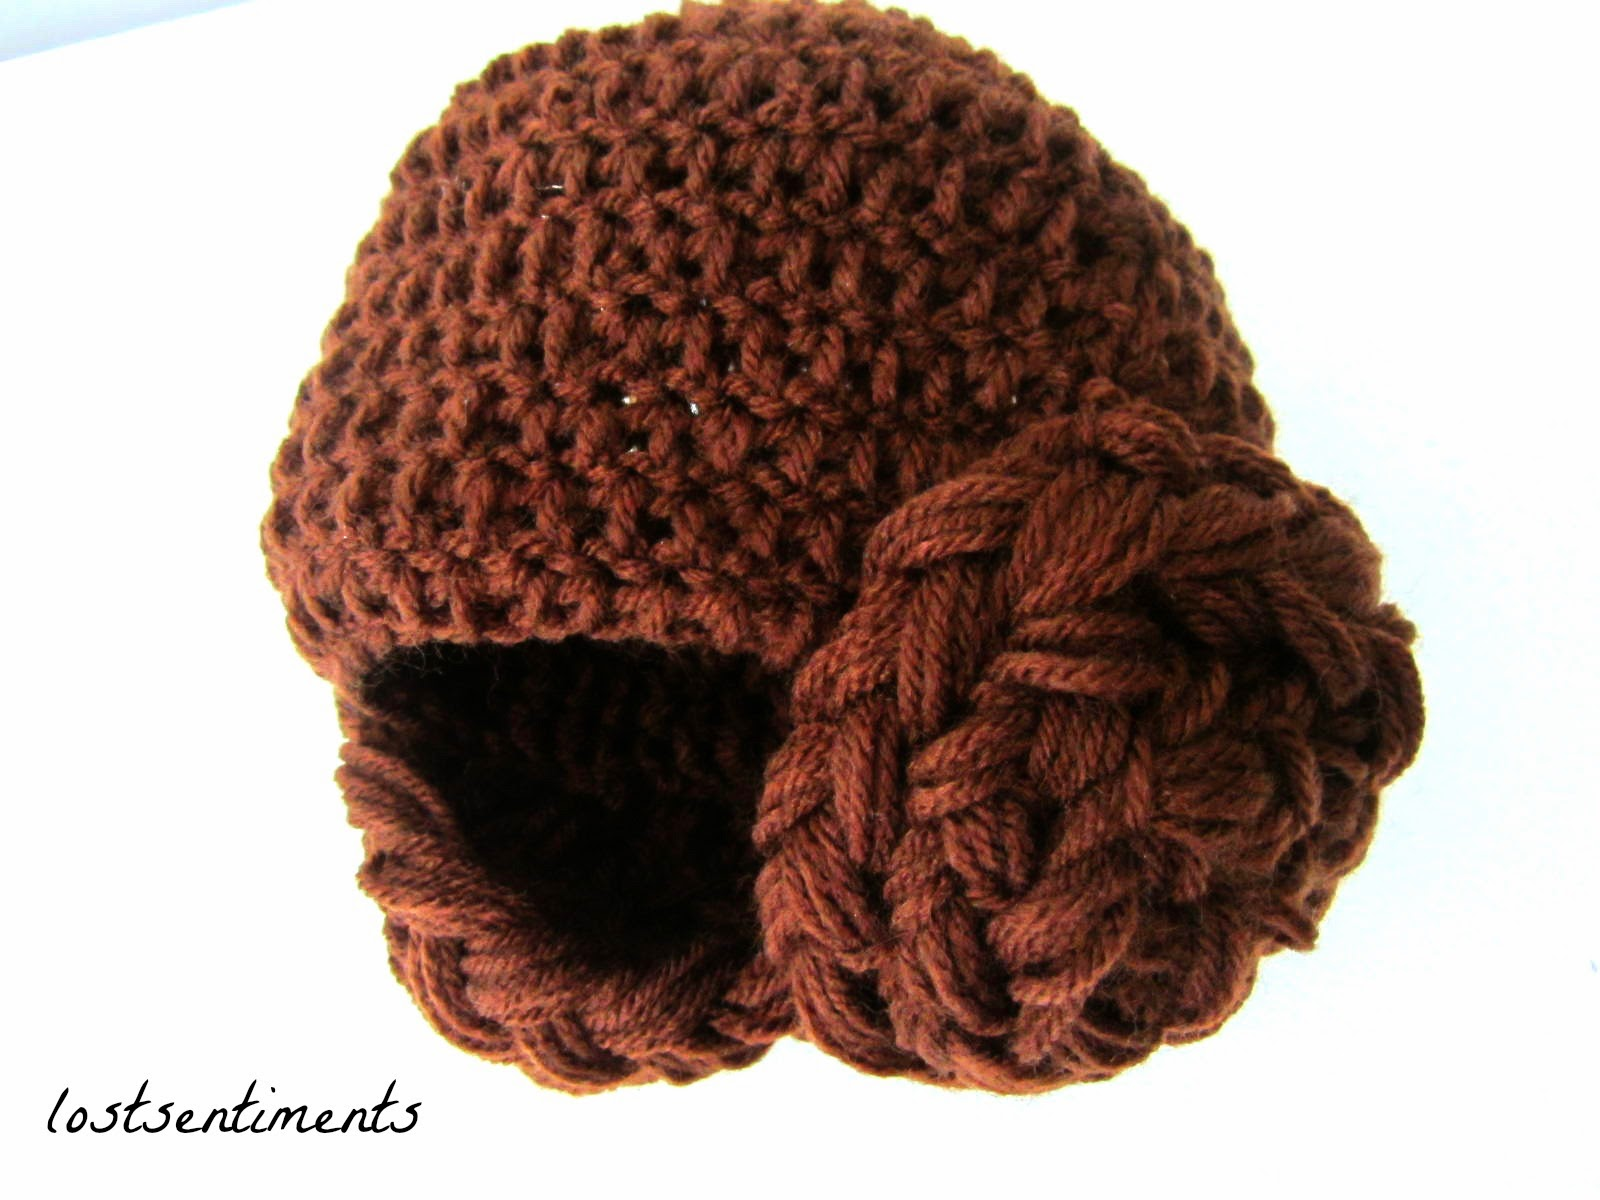 Crochet Pattern Princess Leia Hat : lostsentiments: Princess Leia Crocheted Hat for 3 - 6 ...